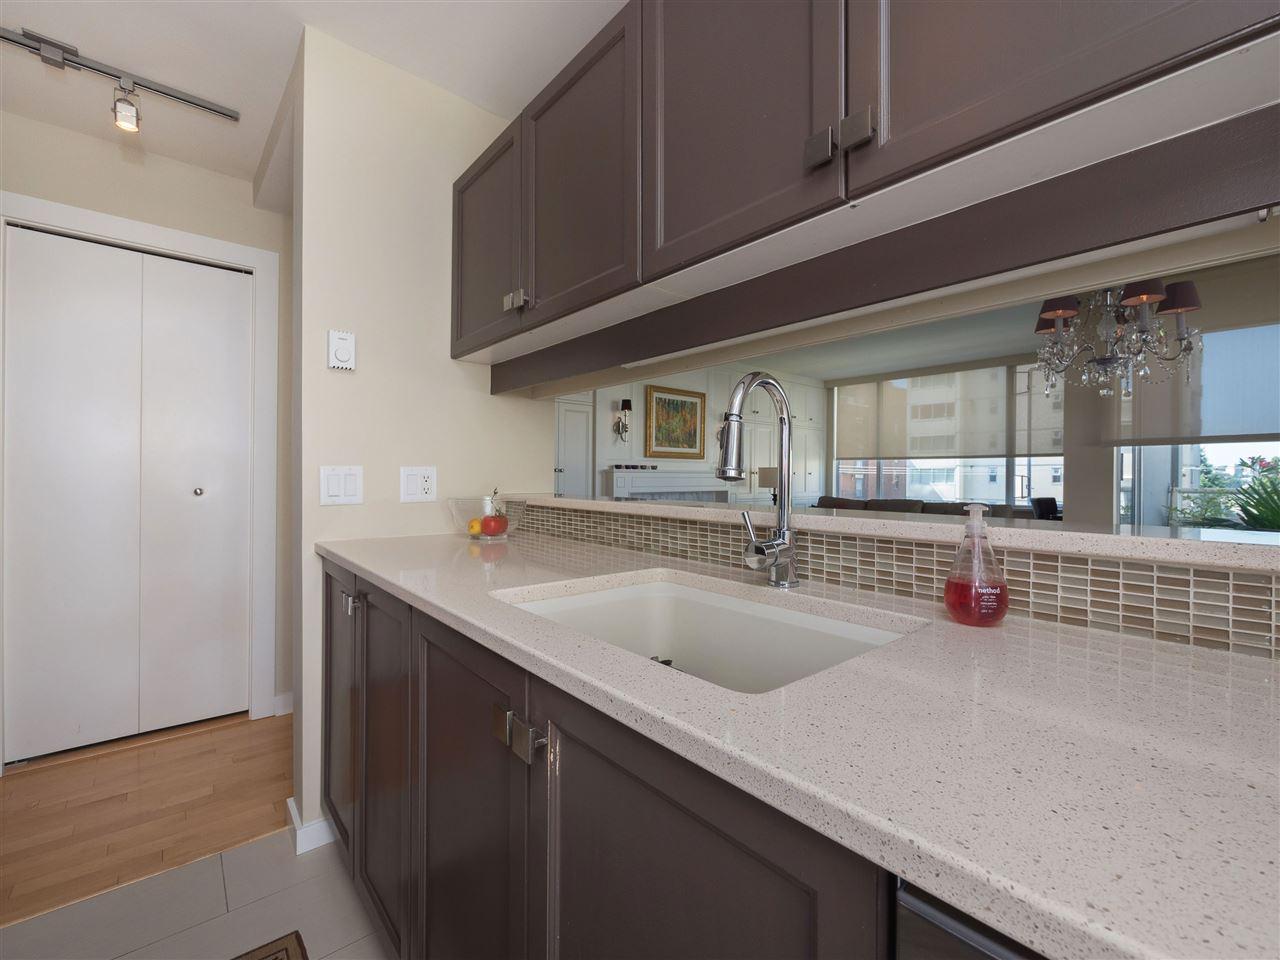 Condo Apartment at 303 1436 HARWOOD STREET, Unit 303, Vancouver West, British Columbia. Image 8